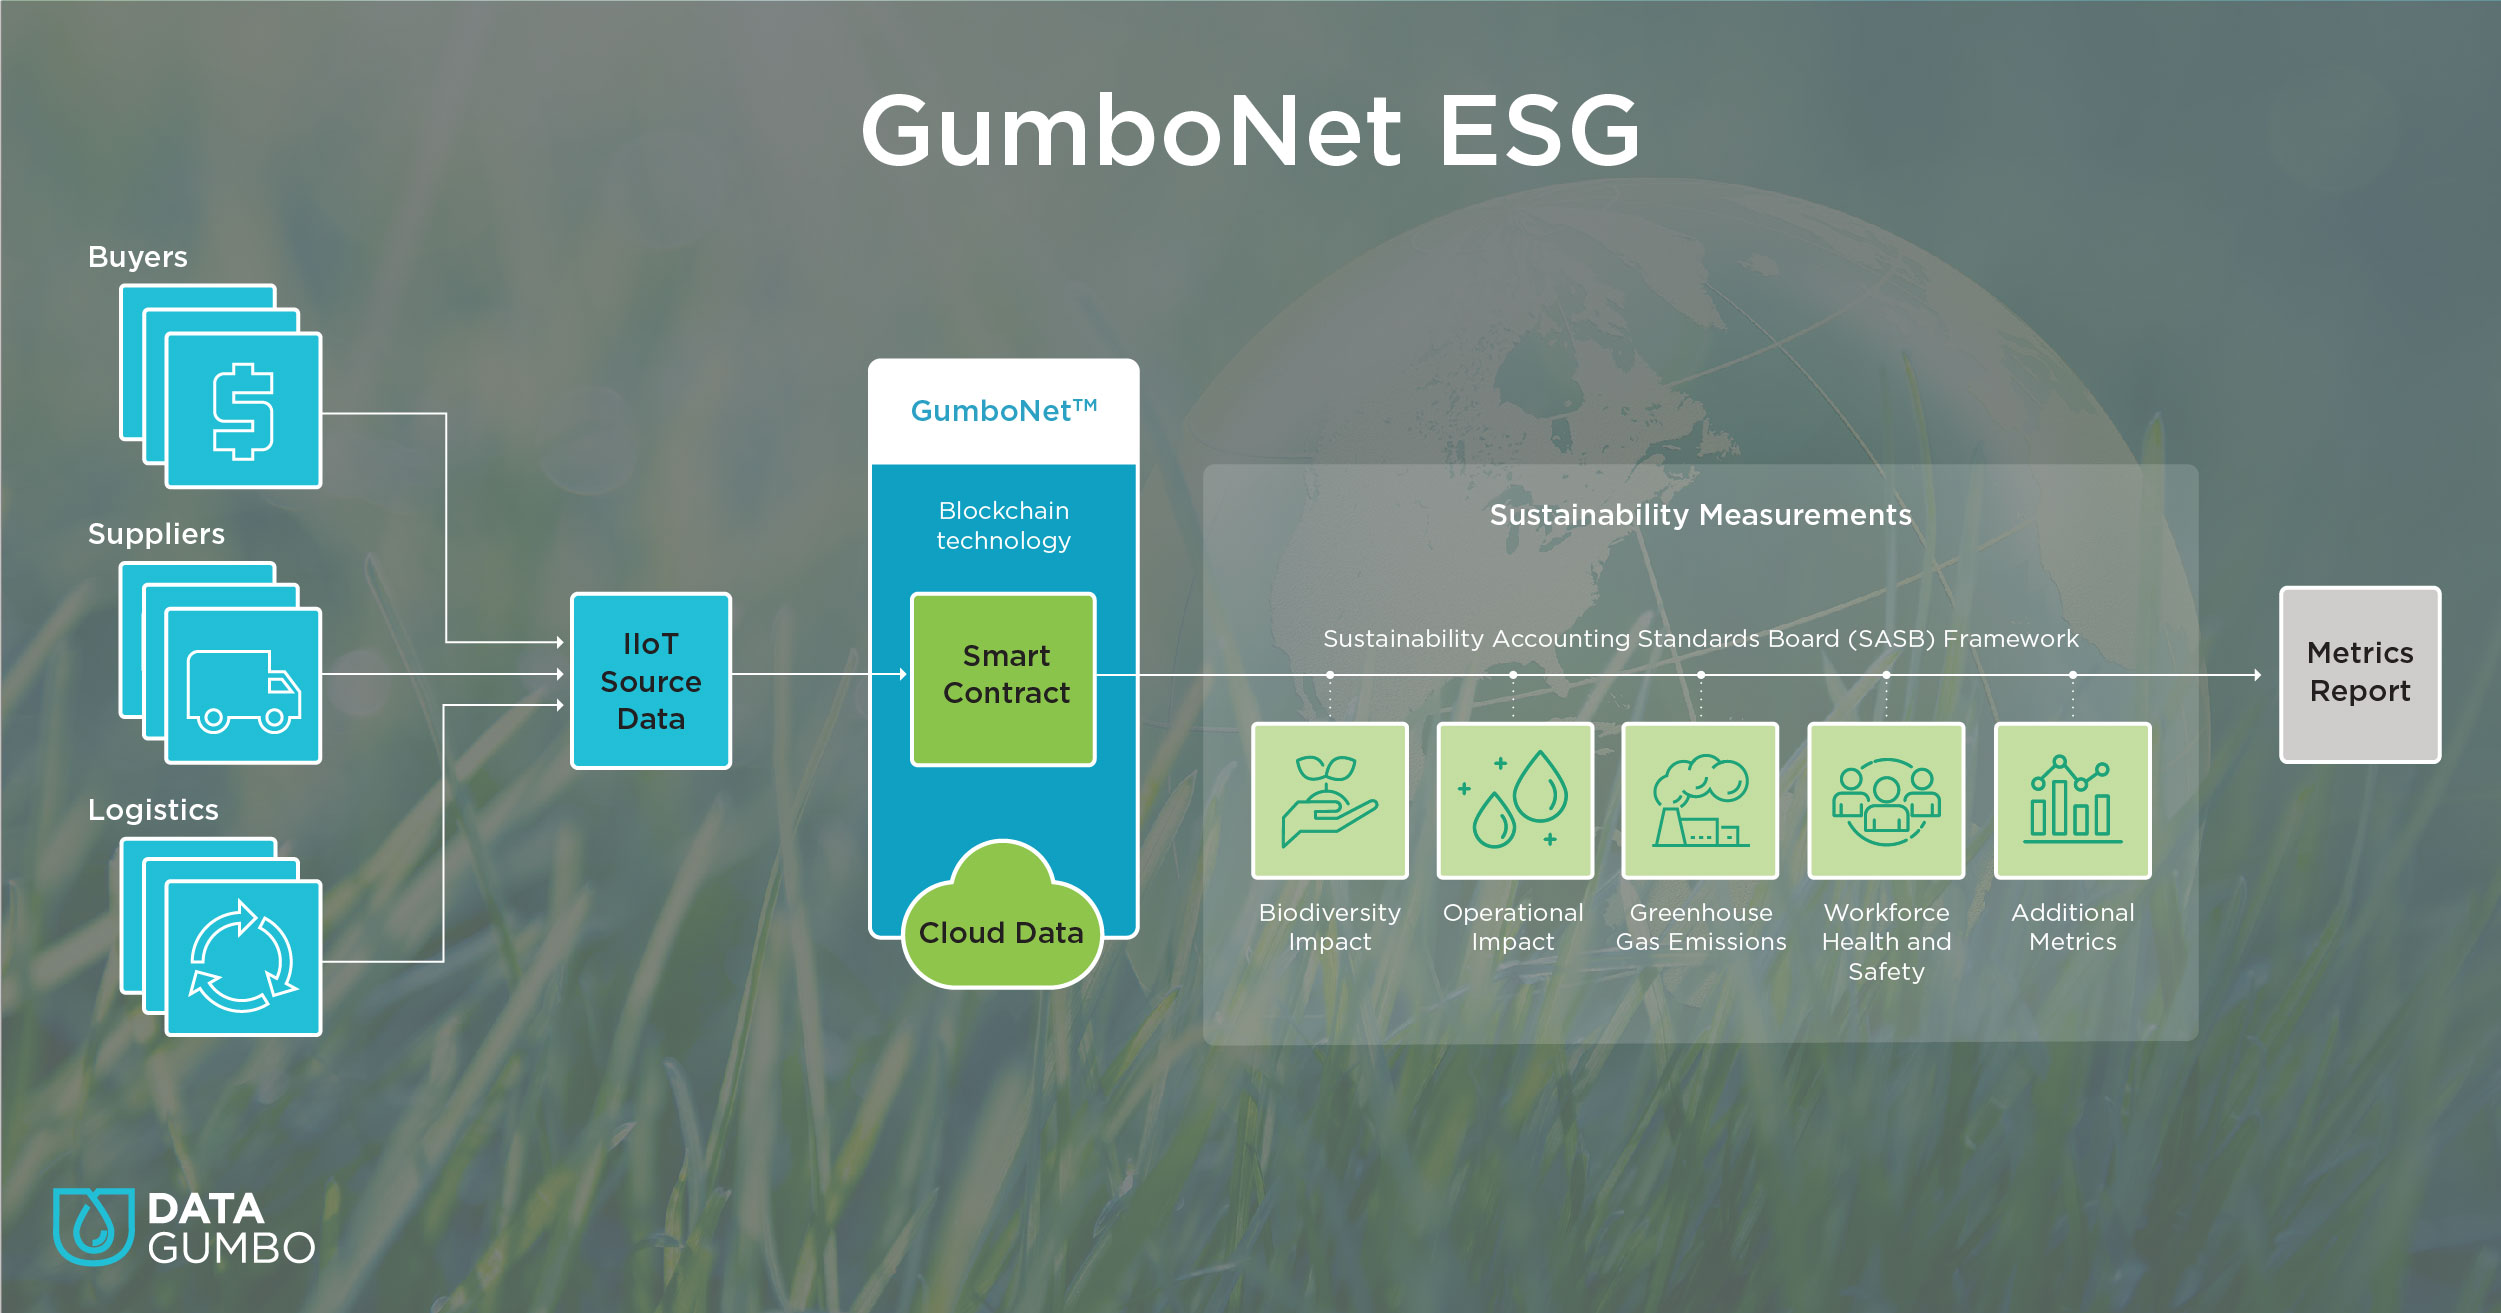 GumboNet-ESG_1200x630-2